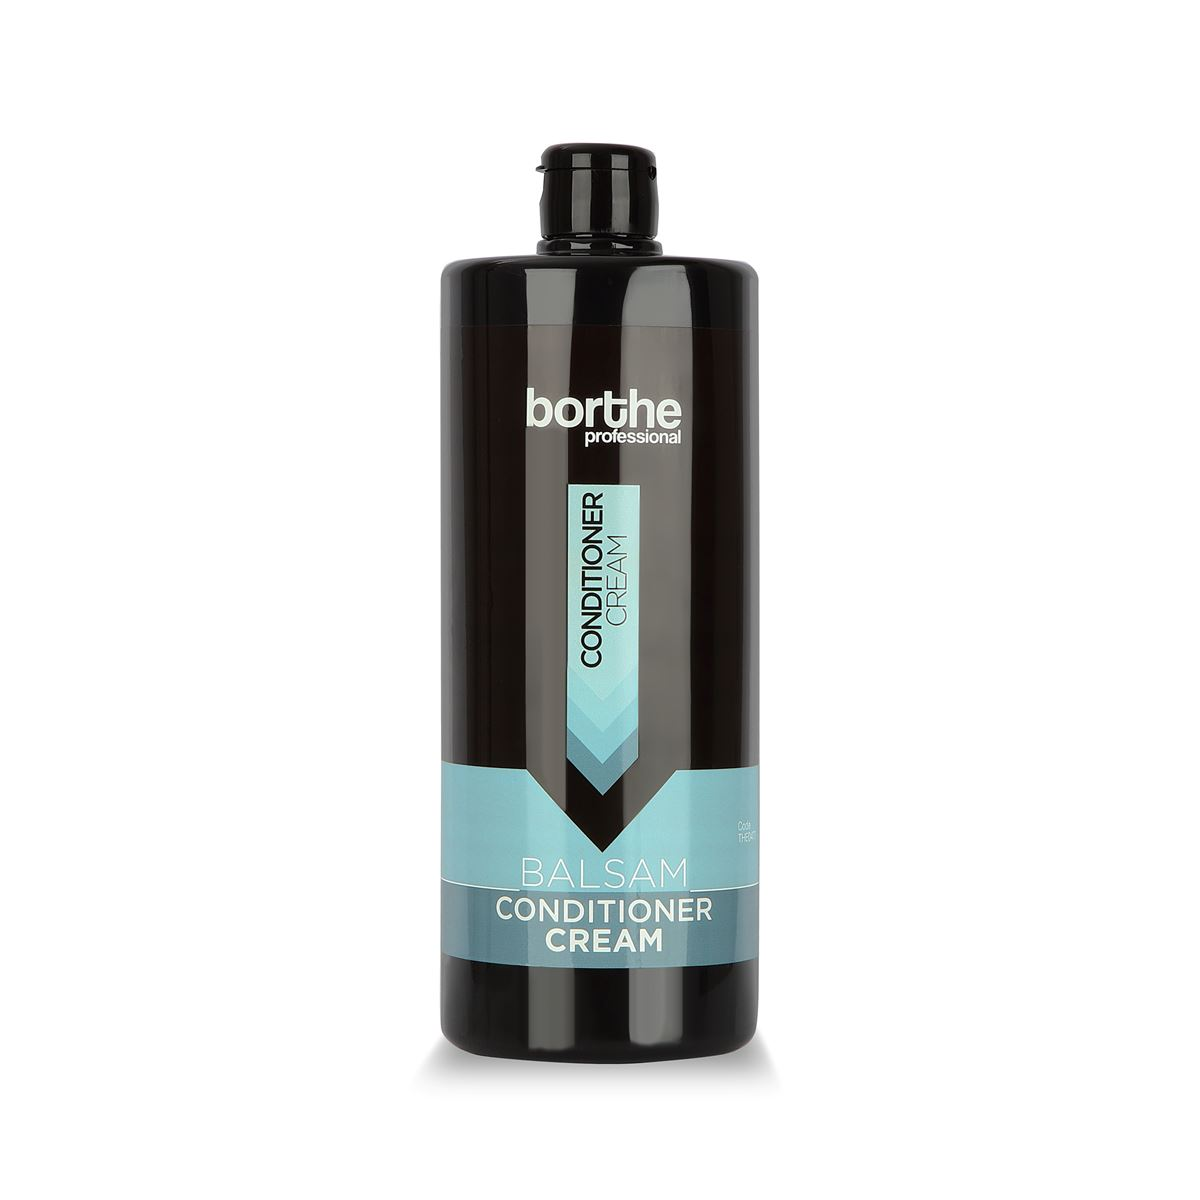 Borthe Balsam Conditioner Cream 1100 ml.